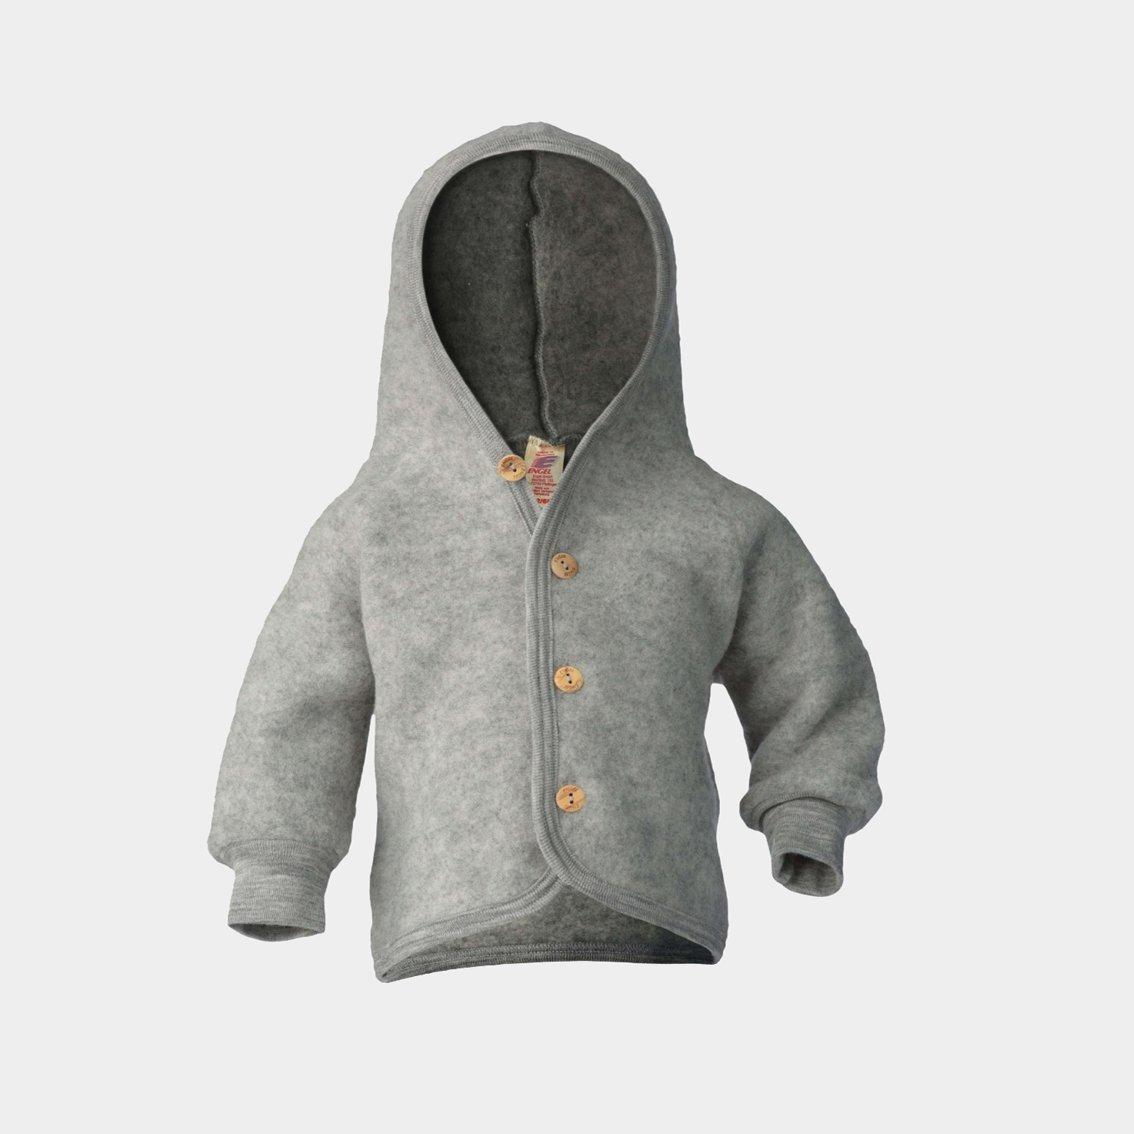 Image of Engel Hooded Jacket Gray